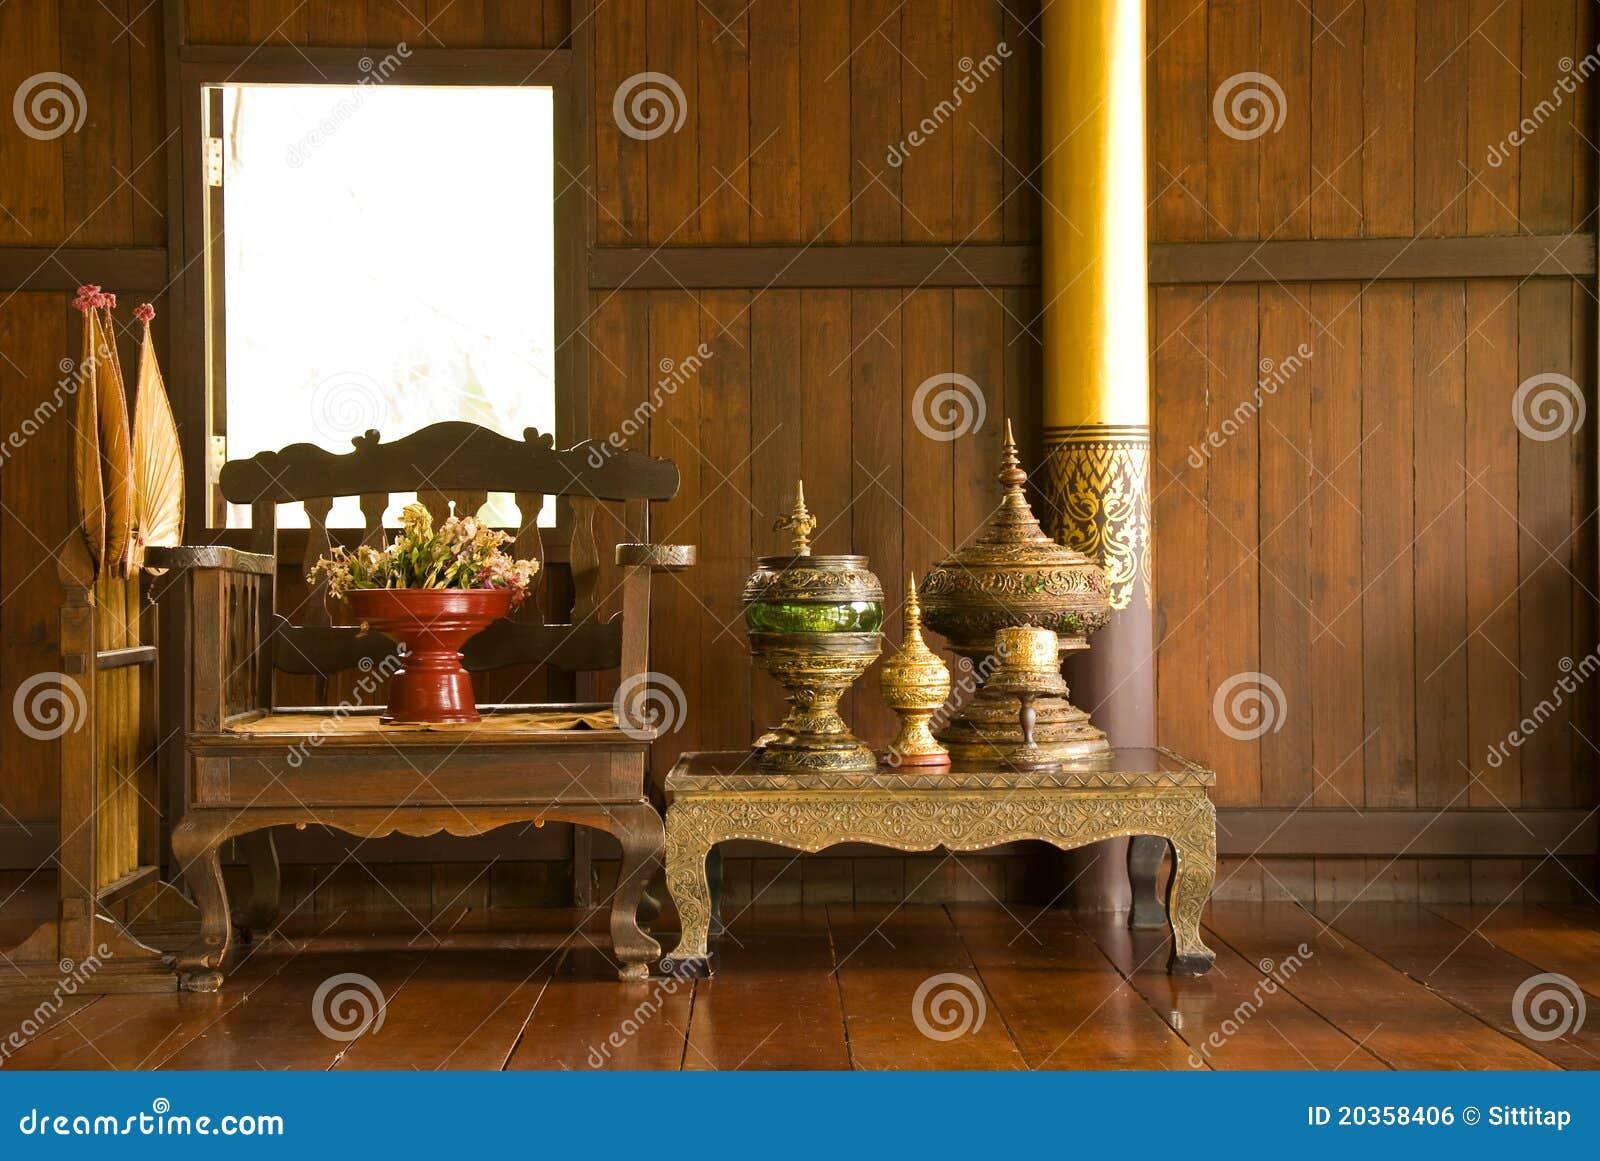 Muebles marrones antiguos 20170818223942 for Muebles antiguos argentina